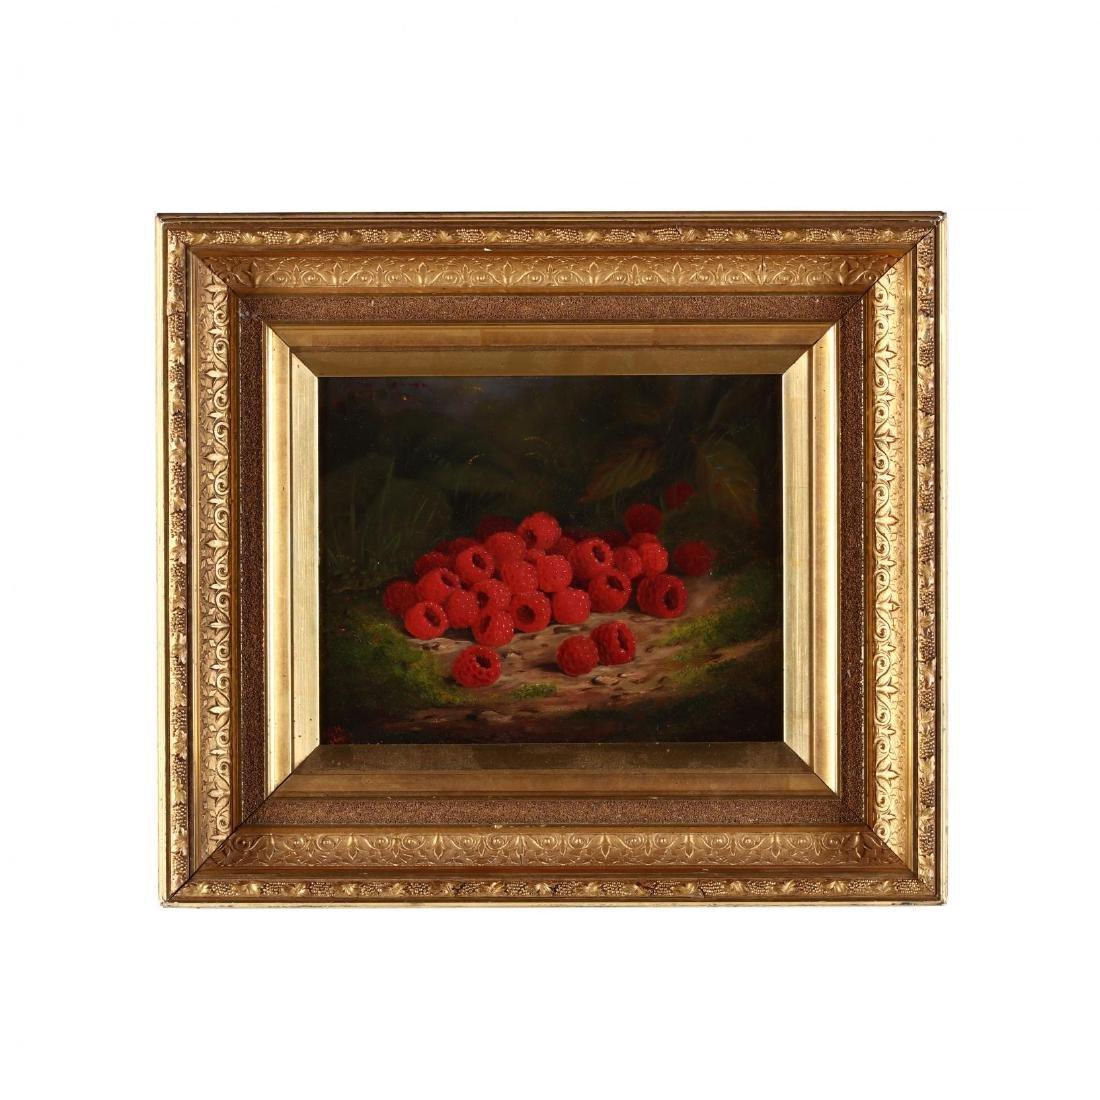 American Pre-Raphaelite Still Life of Raspberries